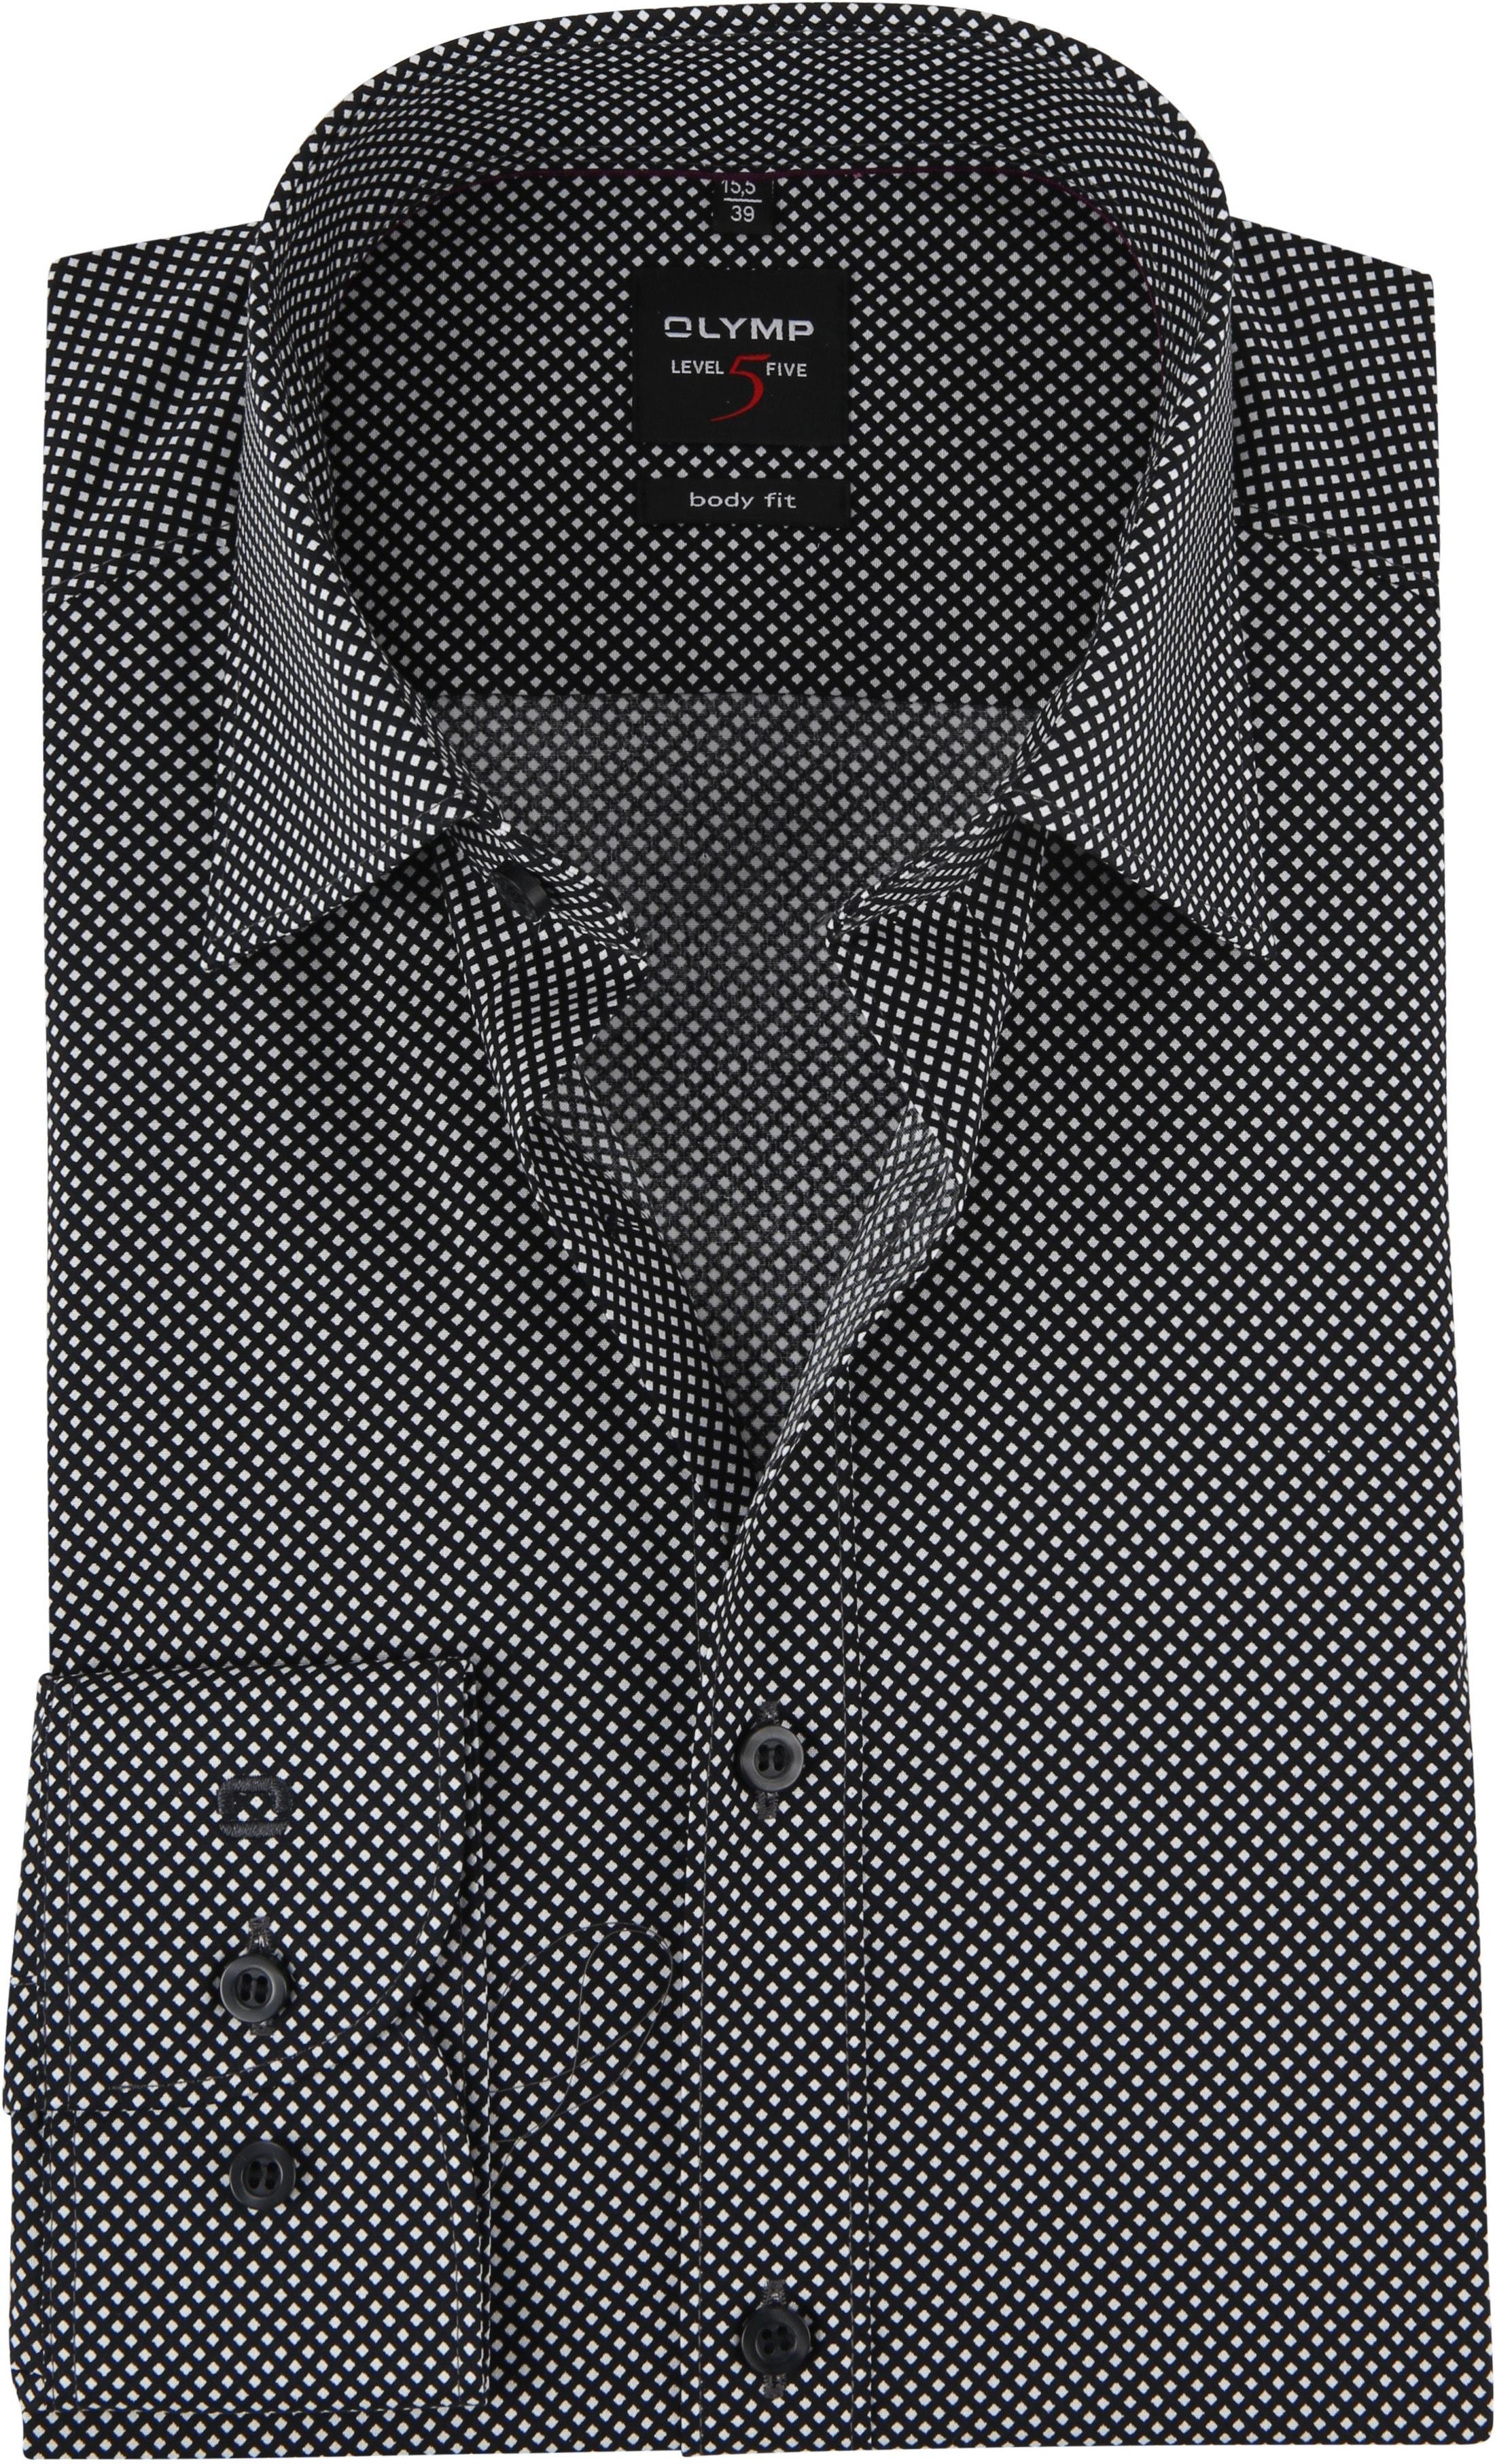 OLYMP Overhemd Level 5 BF Ruit foto 0